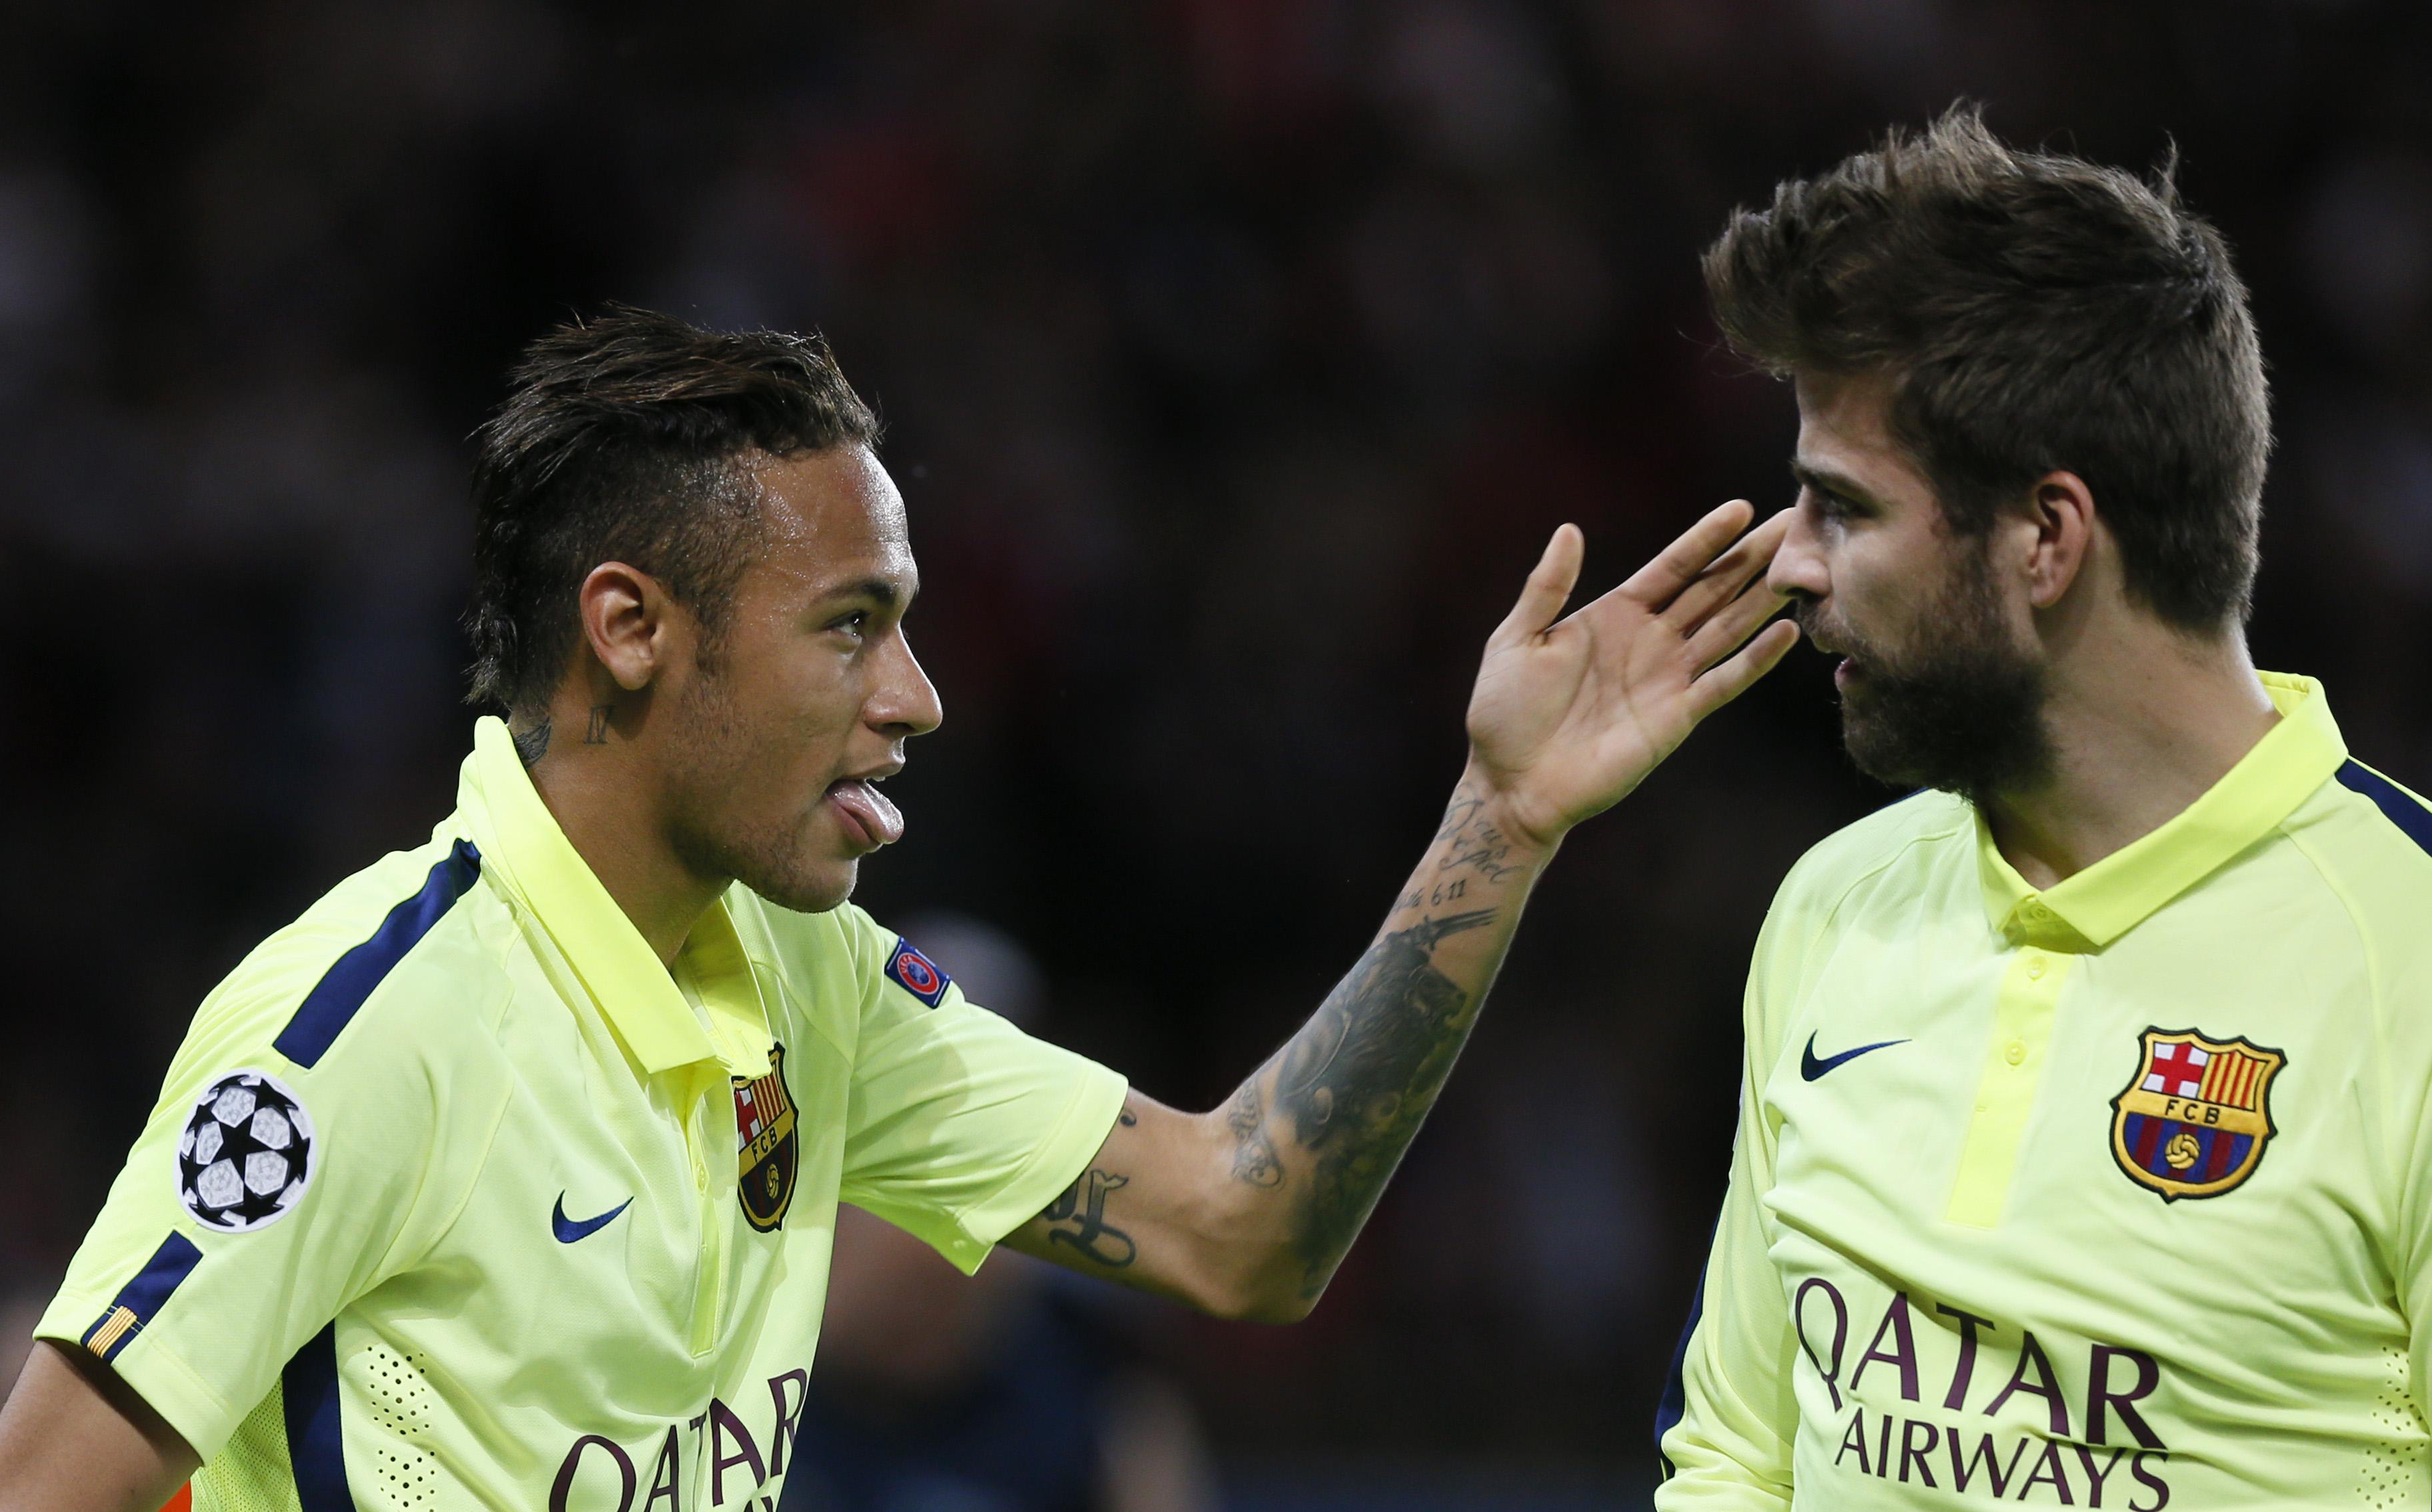 Former teammate Gerard Pique lifts lid on Neymar return talks with Barcelona